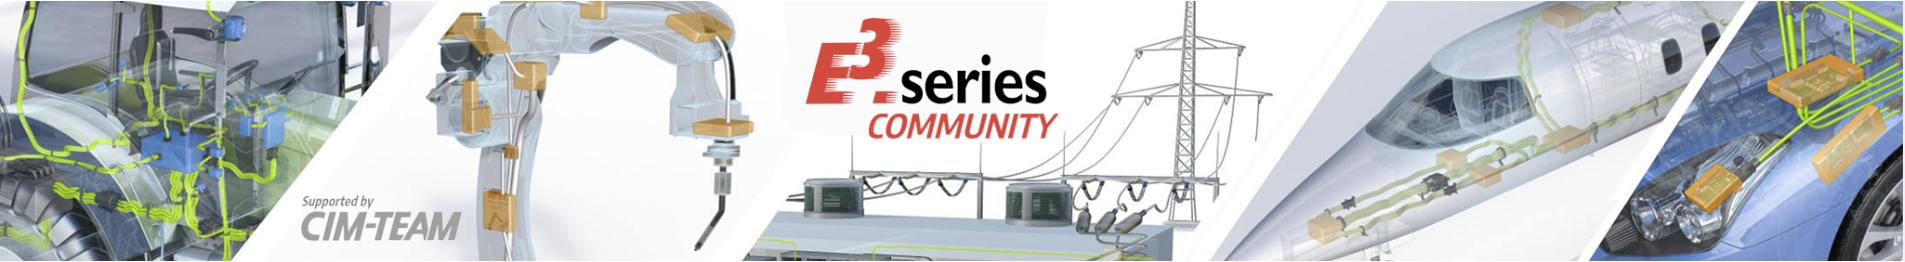 e3seriescommunity-1